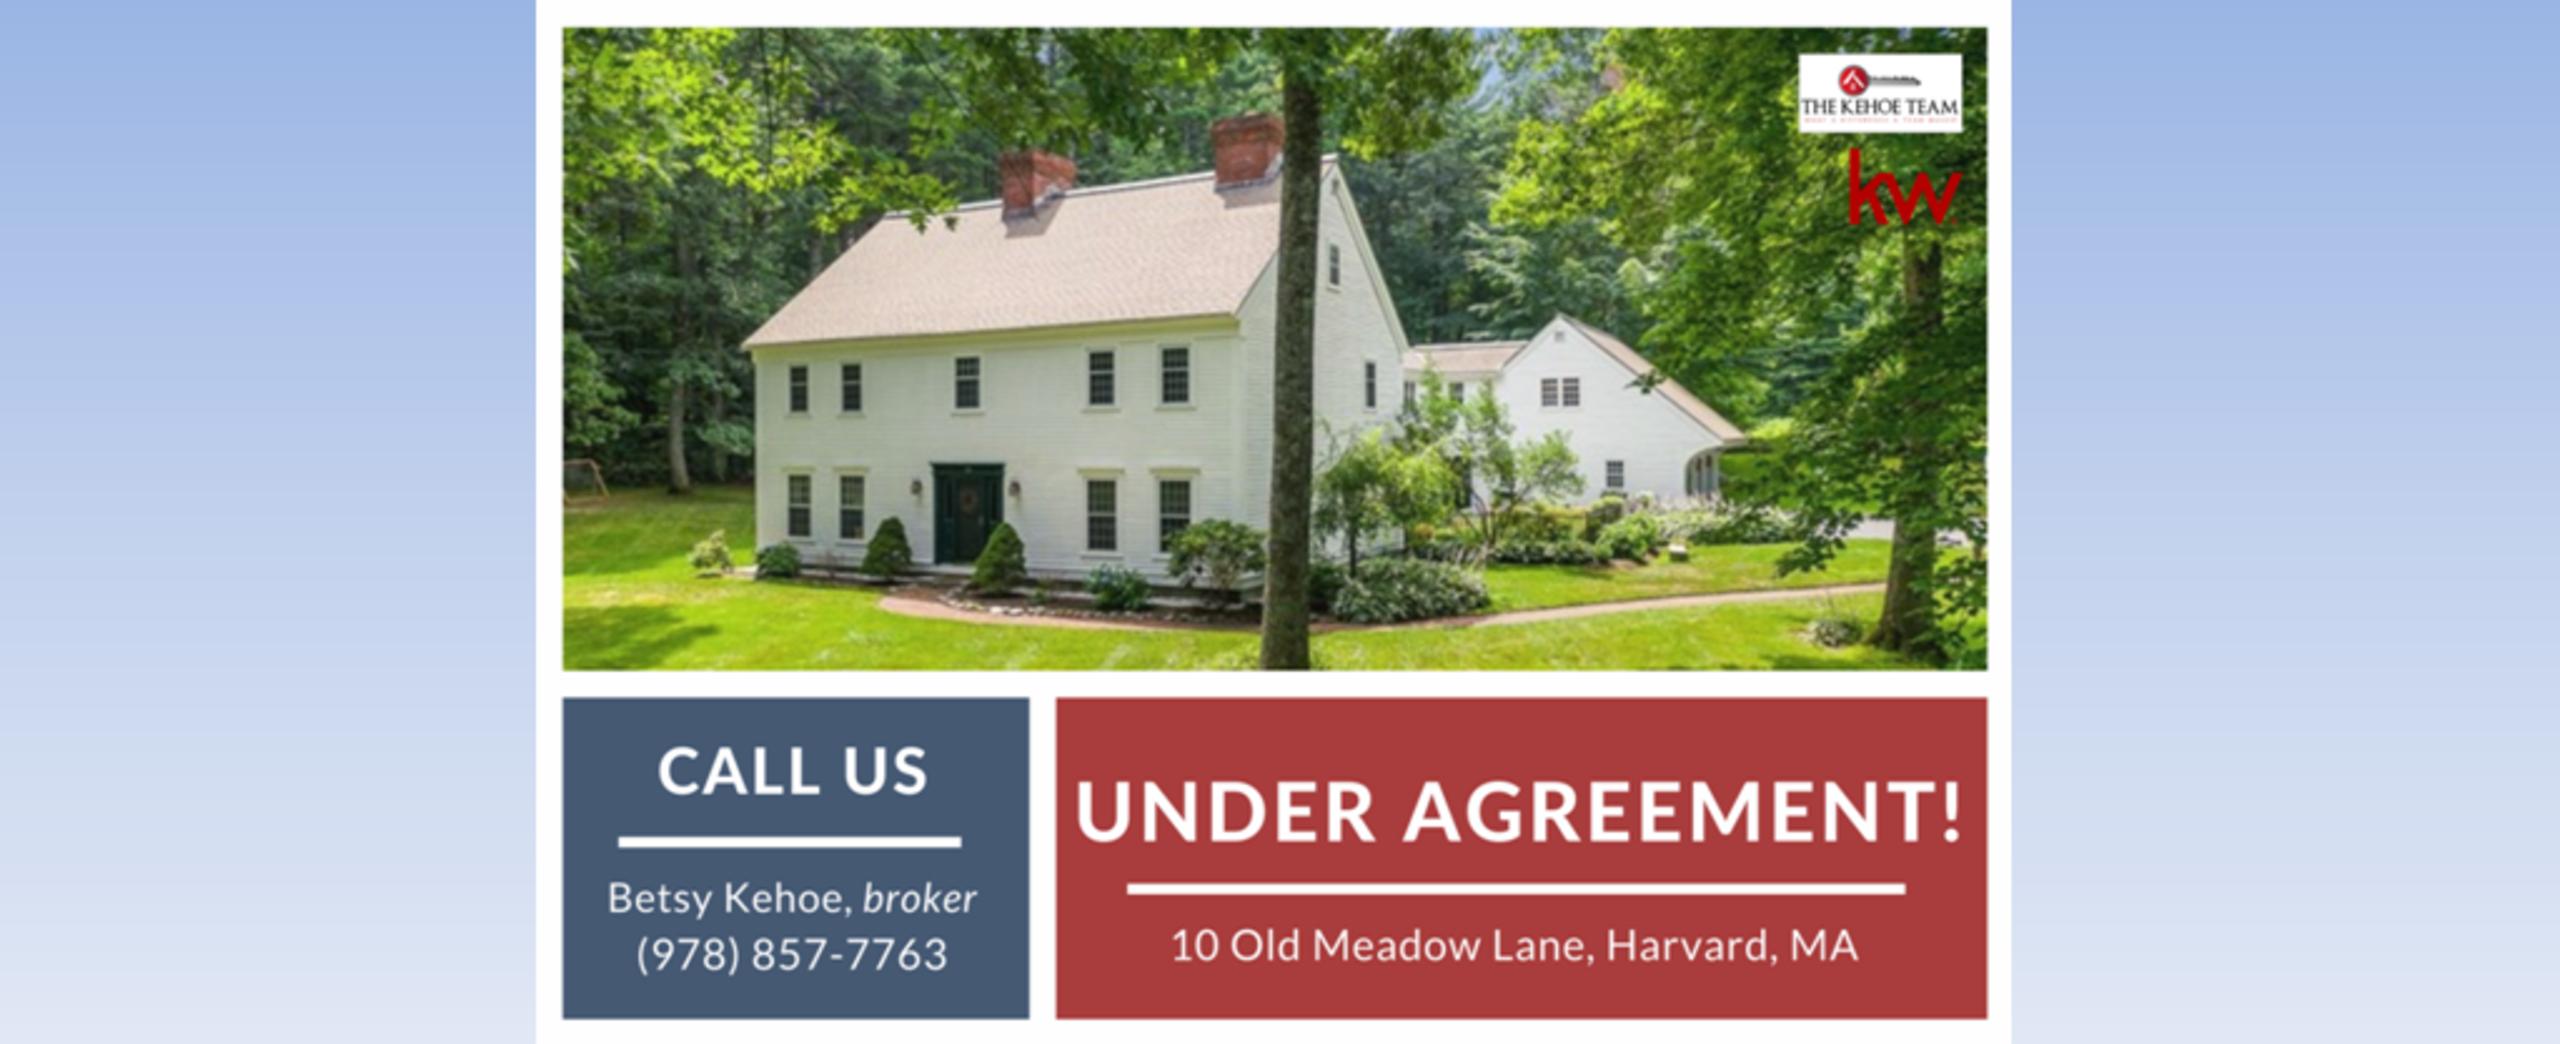 UNDER AGREEMENT - 10 OLD MEADOW LANE HARVARD MA 01451